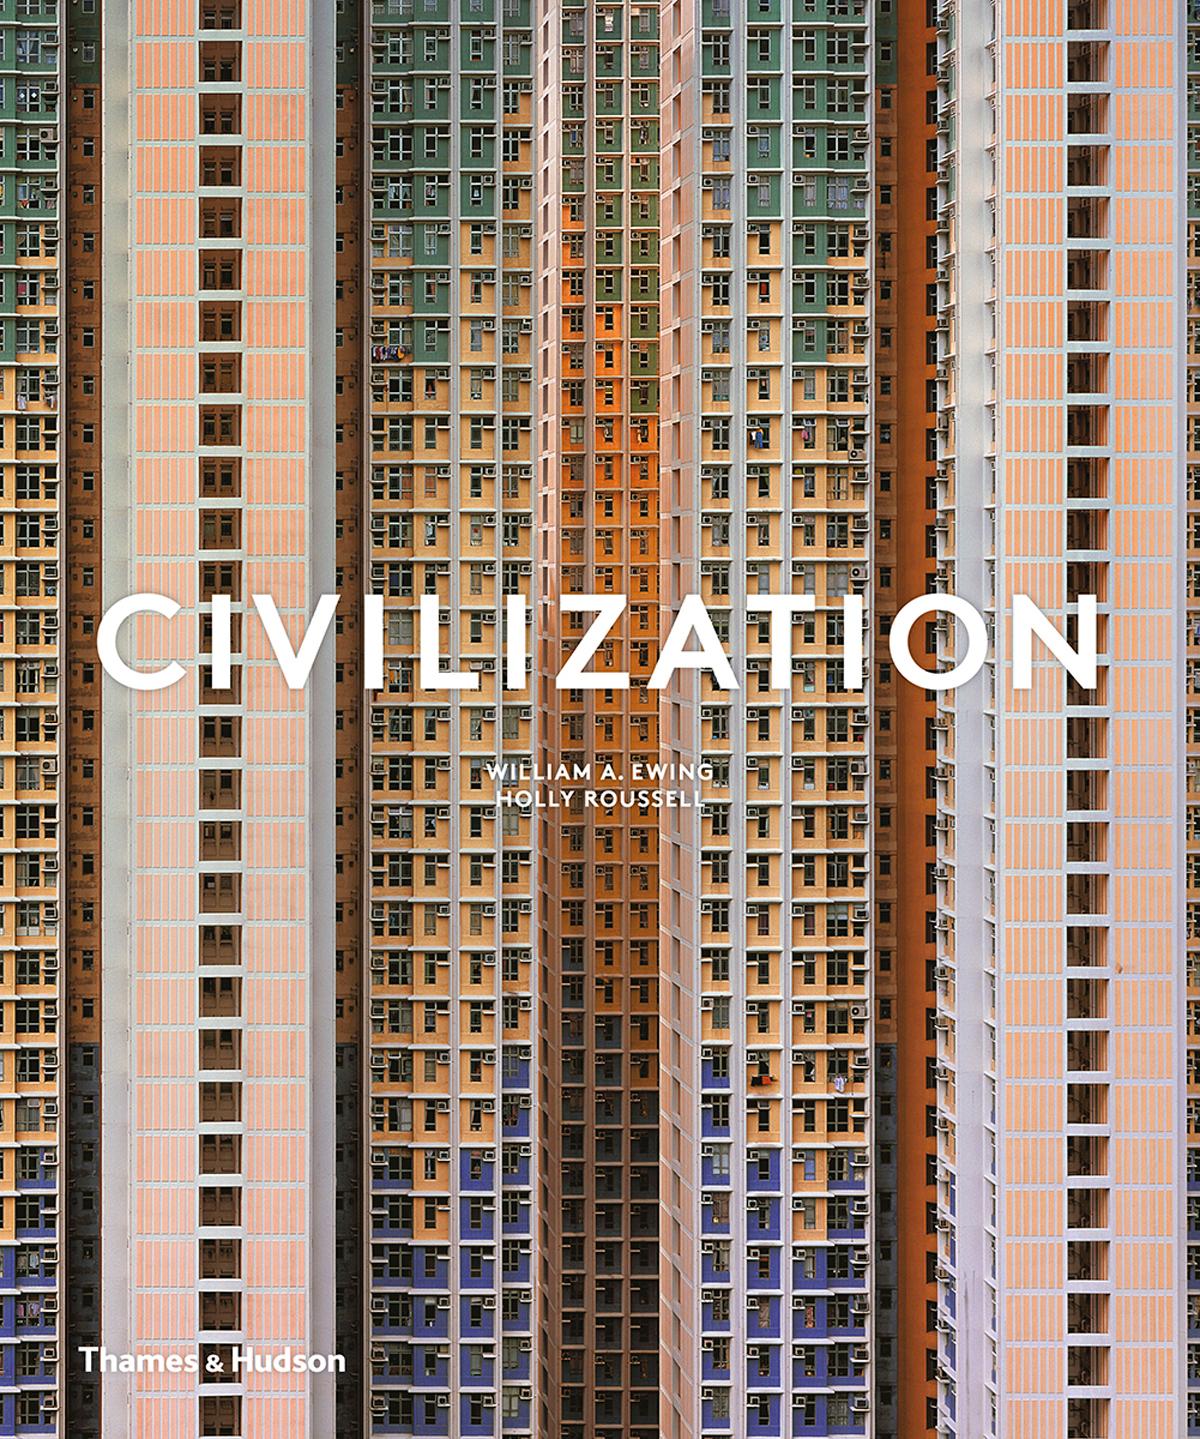 Civilization, jacket